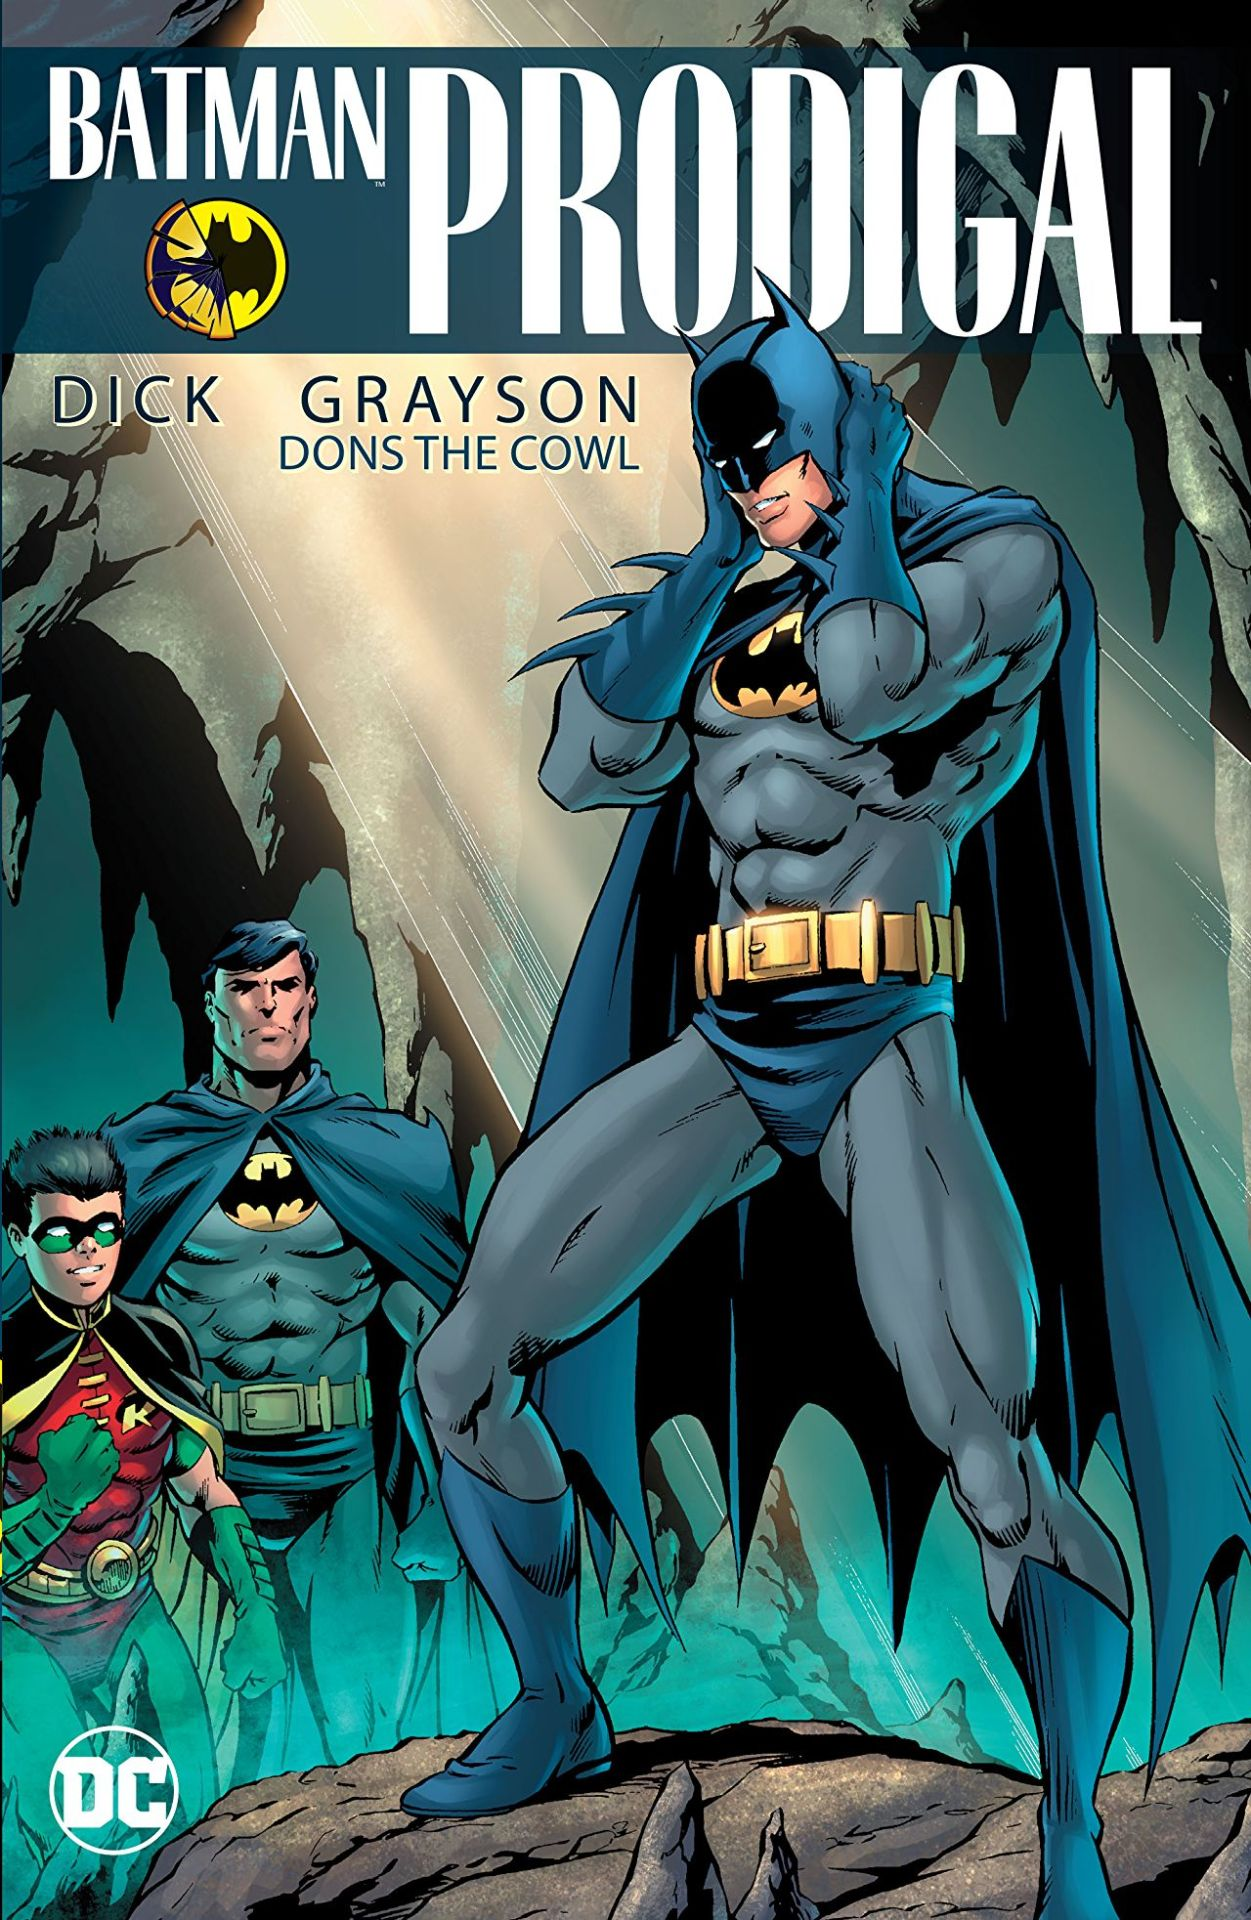 Energetic Buiding Blocks Super Heroes Joker Catman Poison Ivy March Harriet Harley Quinn Glam Metal Batman Dick Grayson Children Gift Toys Toys & Hobbies Blocks